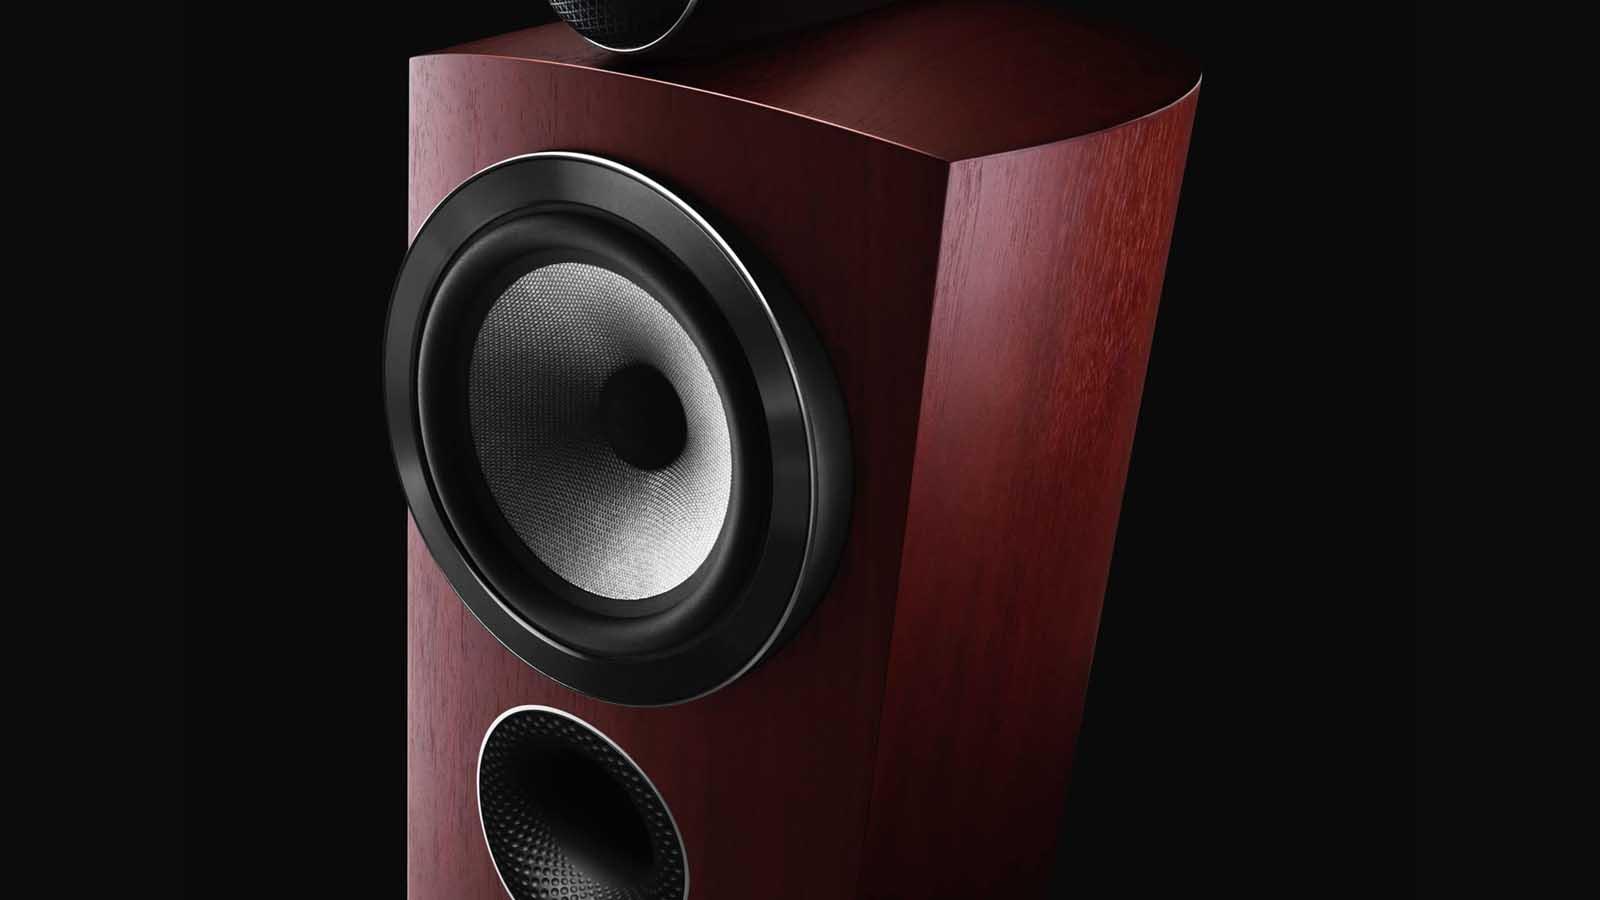 https://lamarque.fillion.ca/wp-content/uploads/2019/04/4-2-d-805-d3-800-series-diamond-speakers-quality-audio.jpg